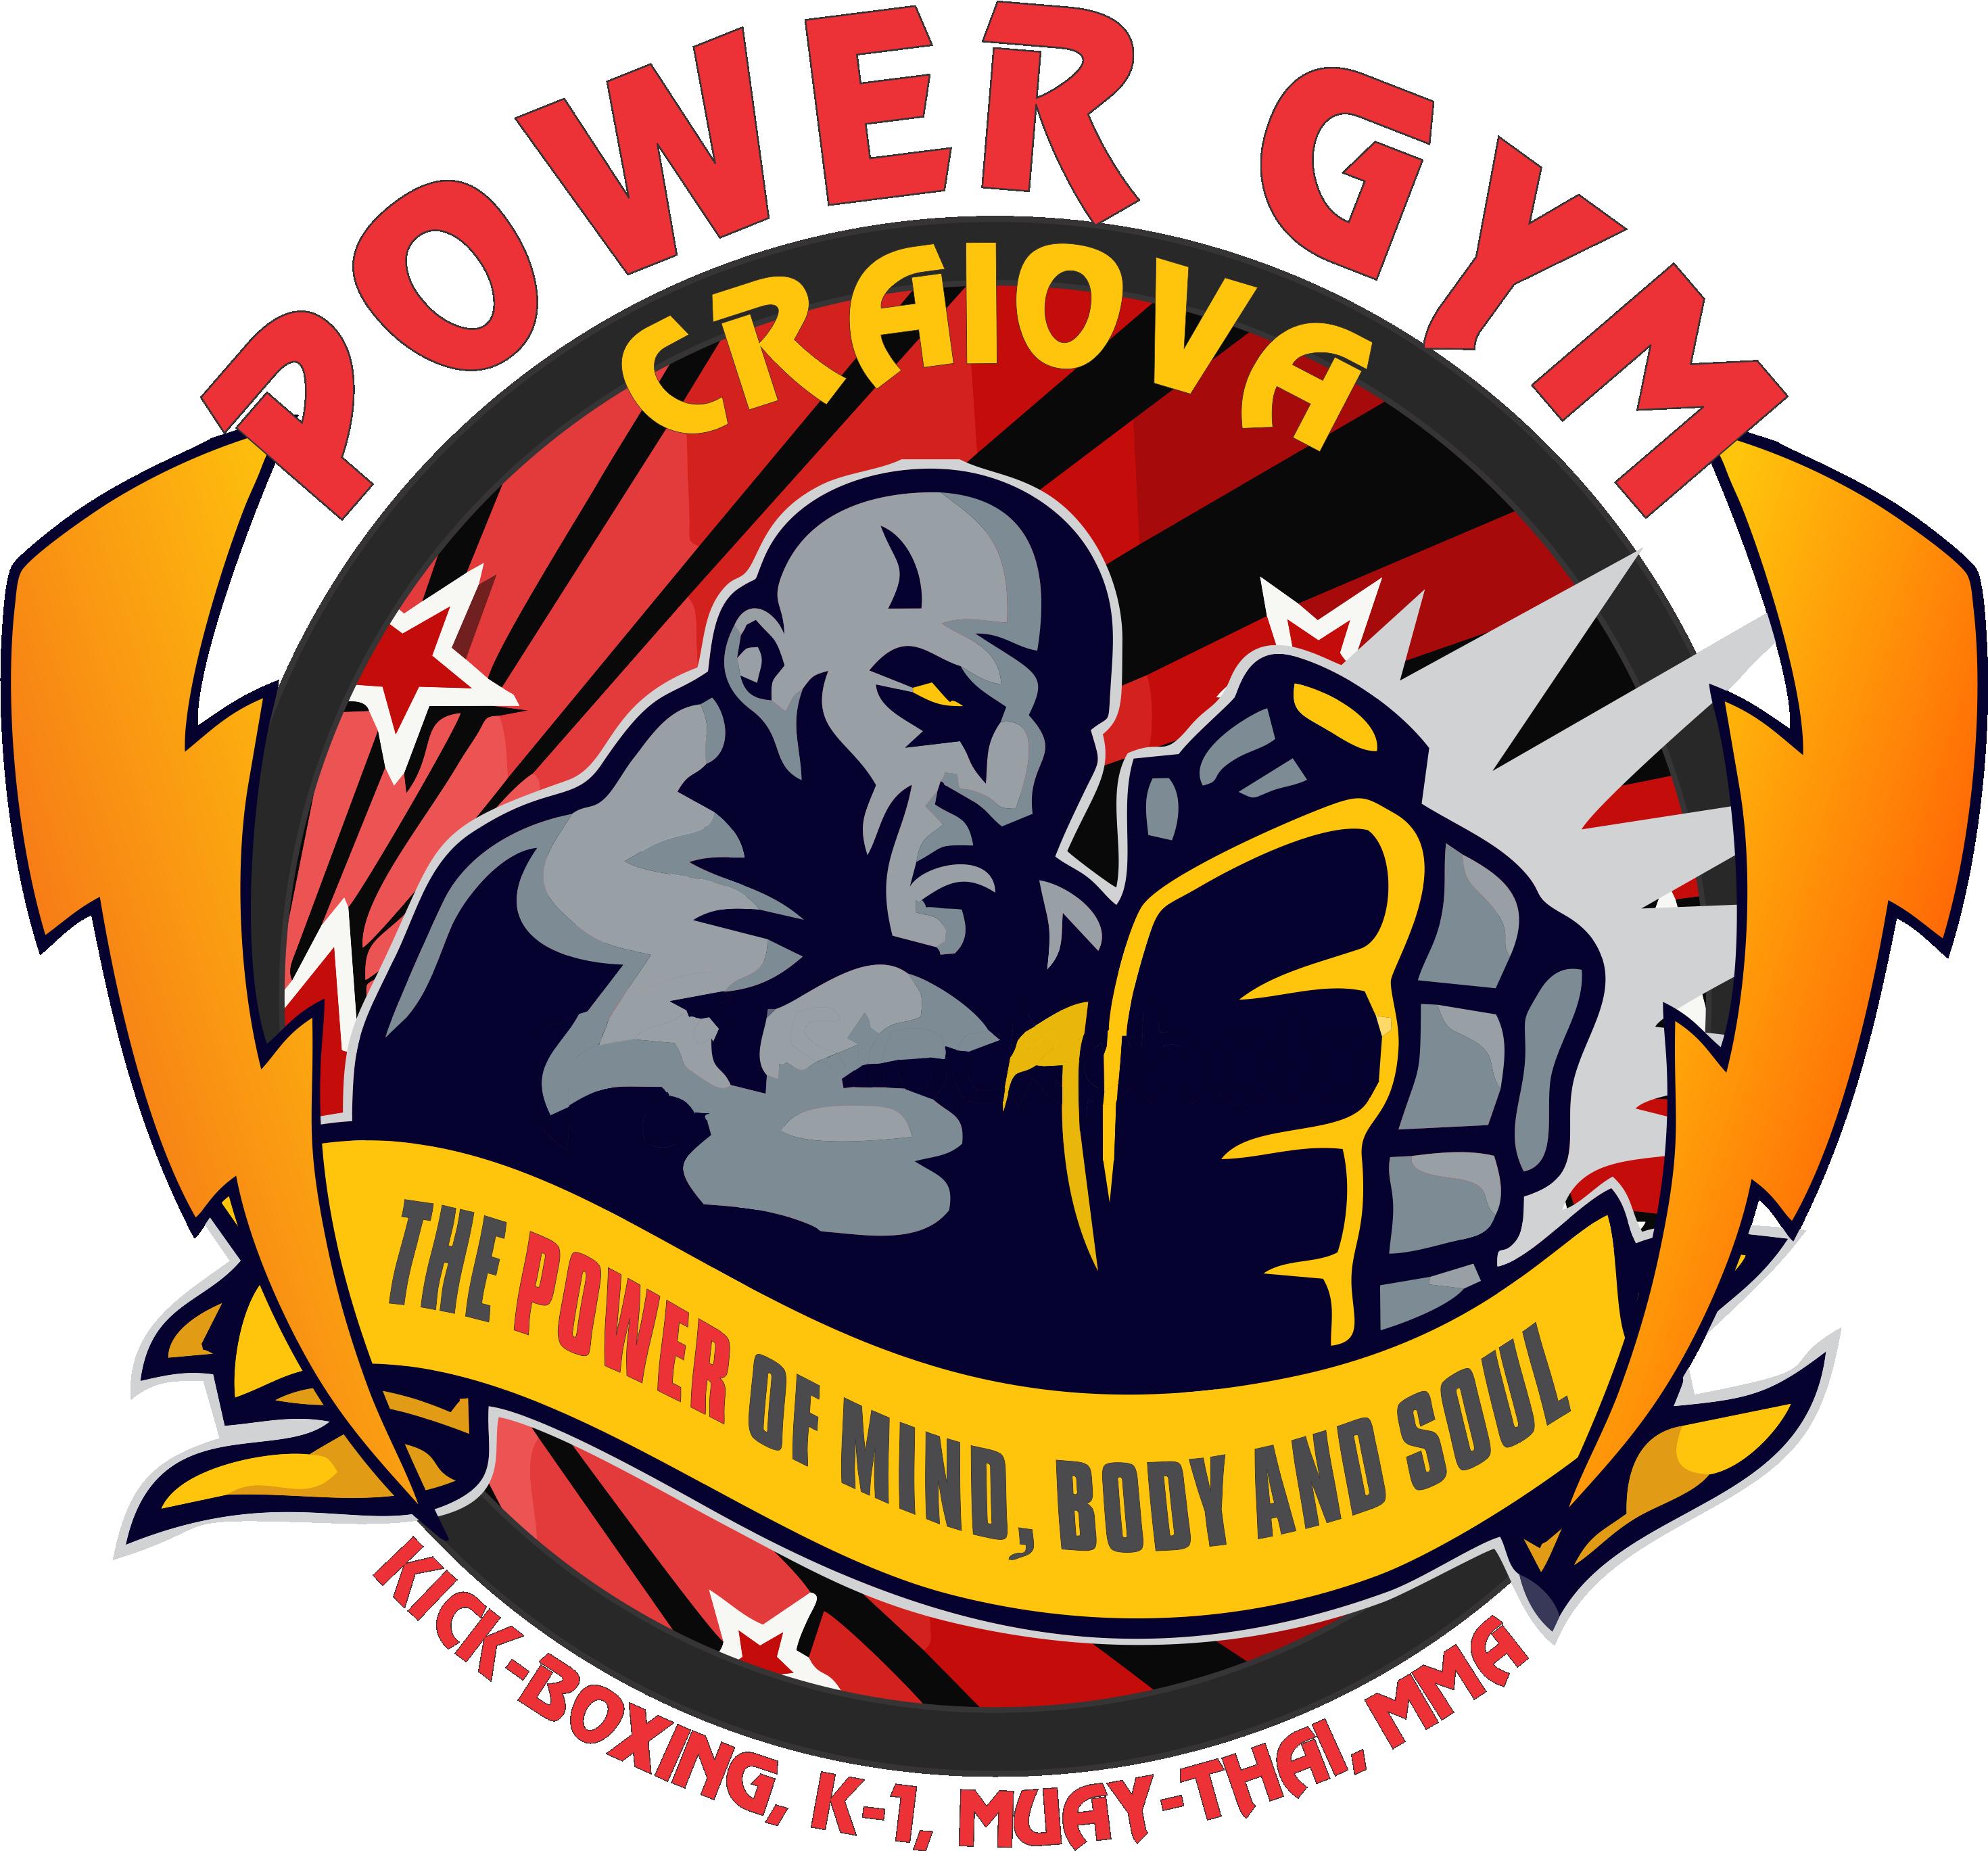 Bine ai venit pe site-ul Power Gym Craiova